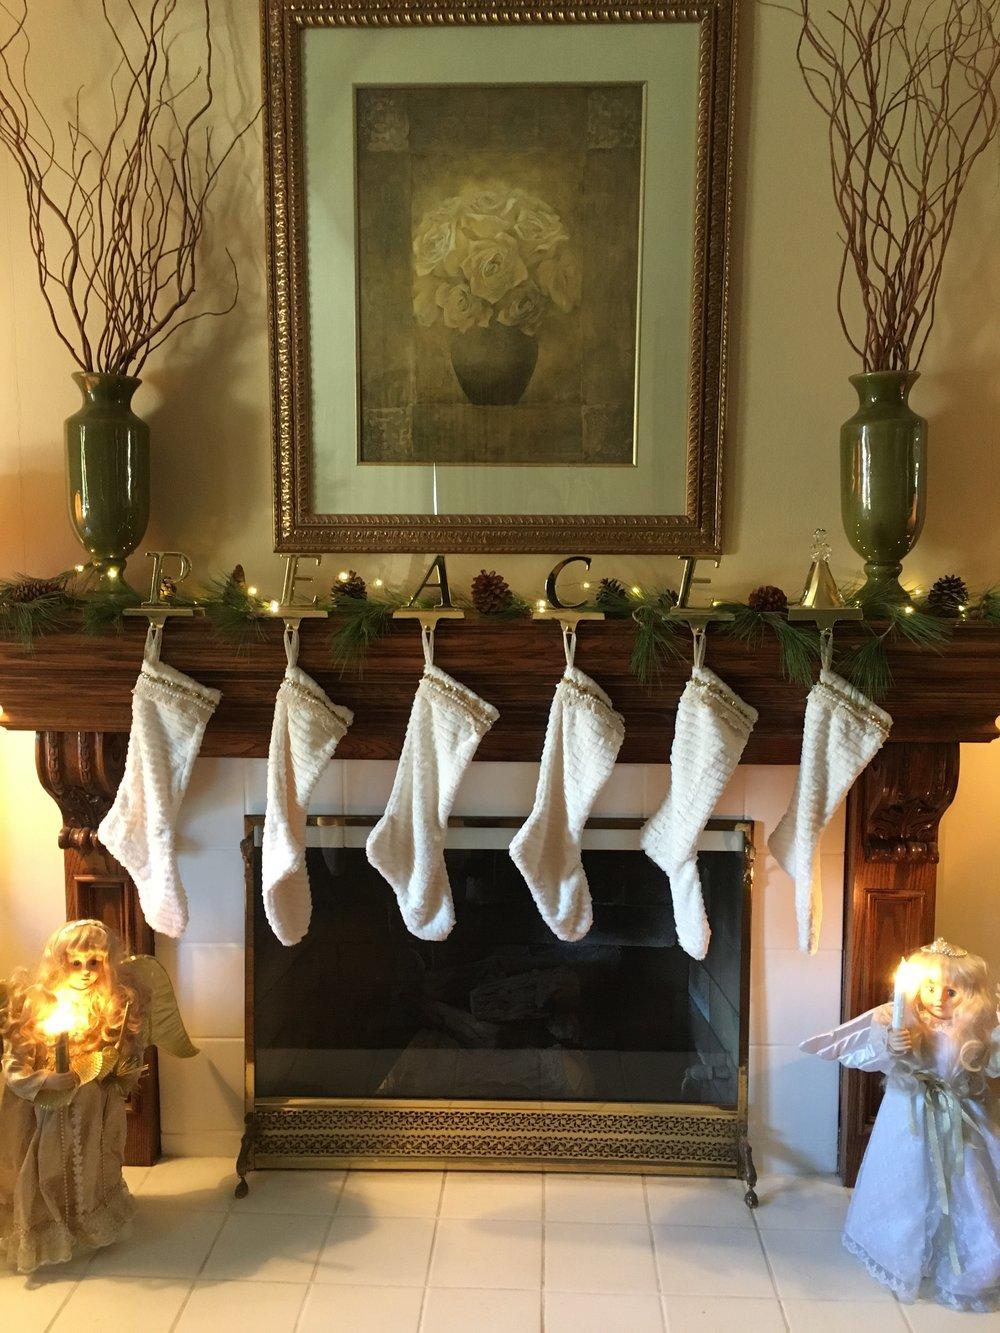 A Simple Christmas Mantle - TammyBlomsterberg.com.JPG